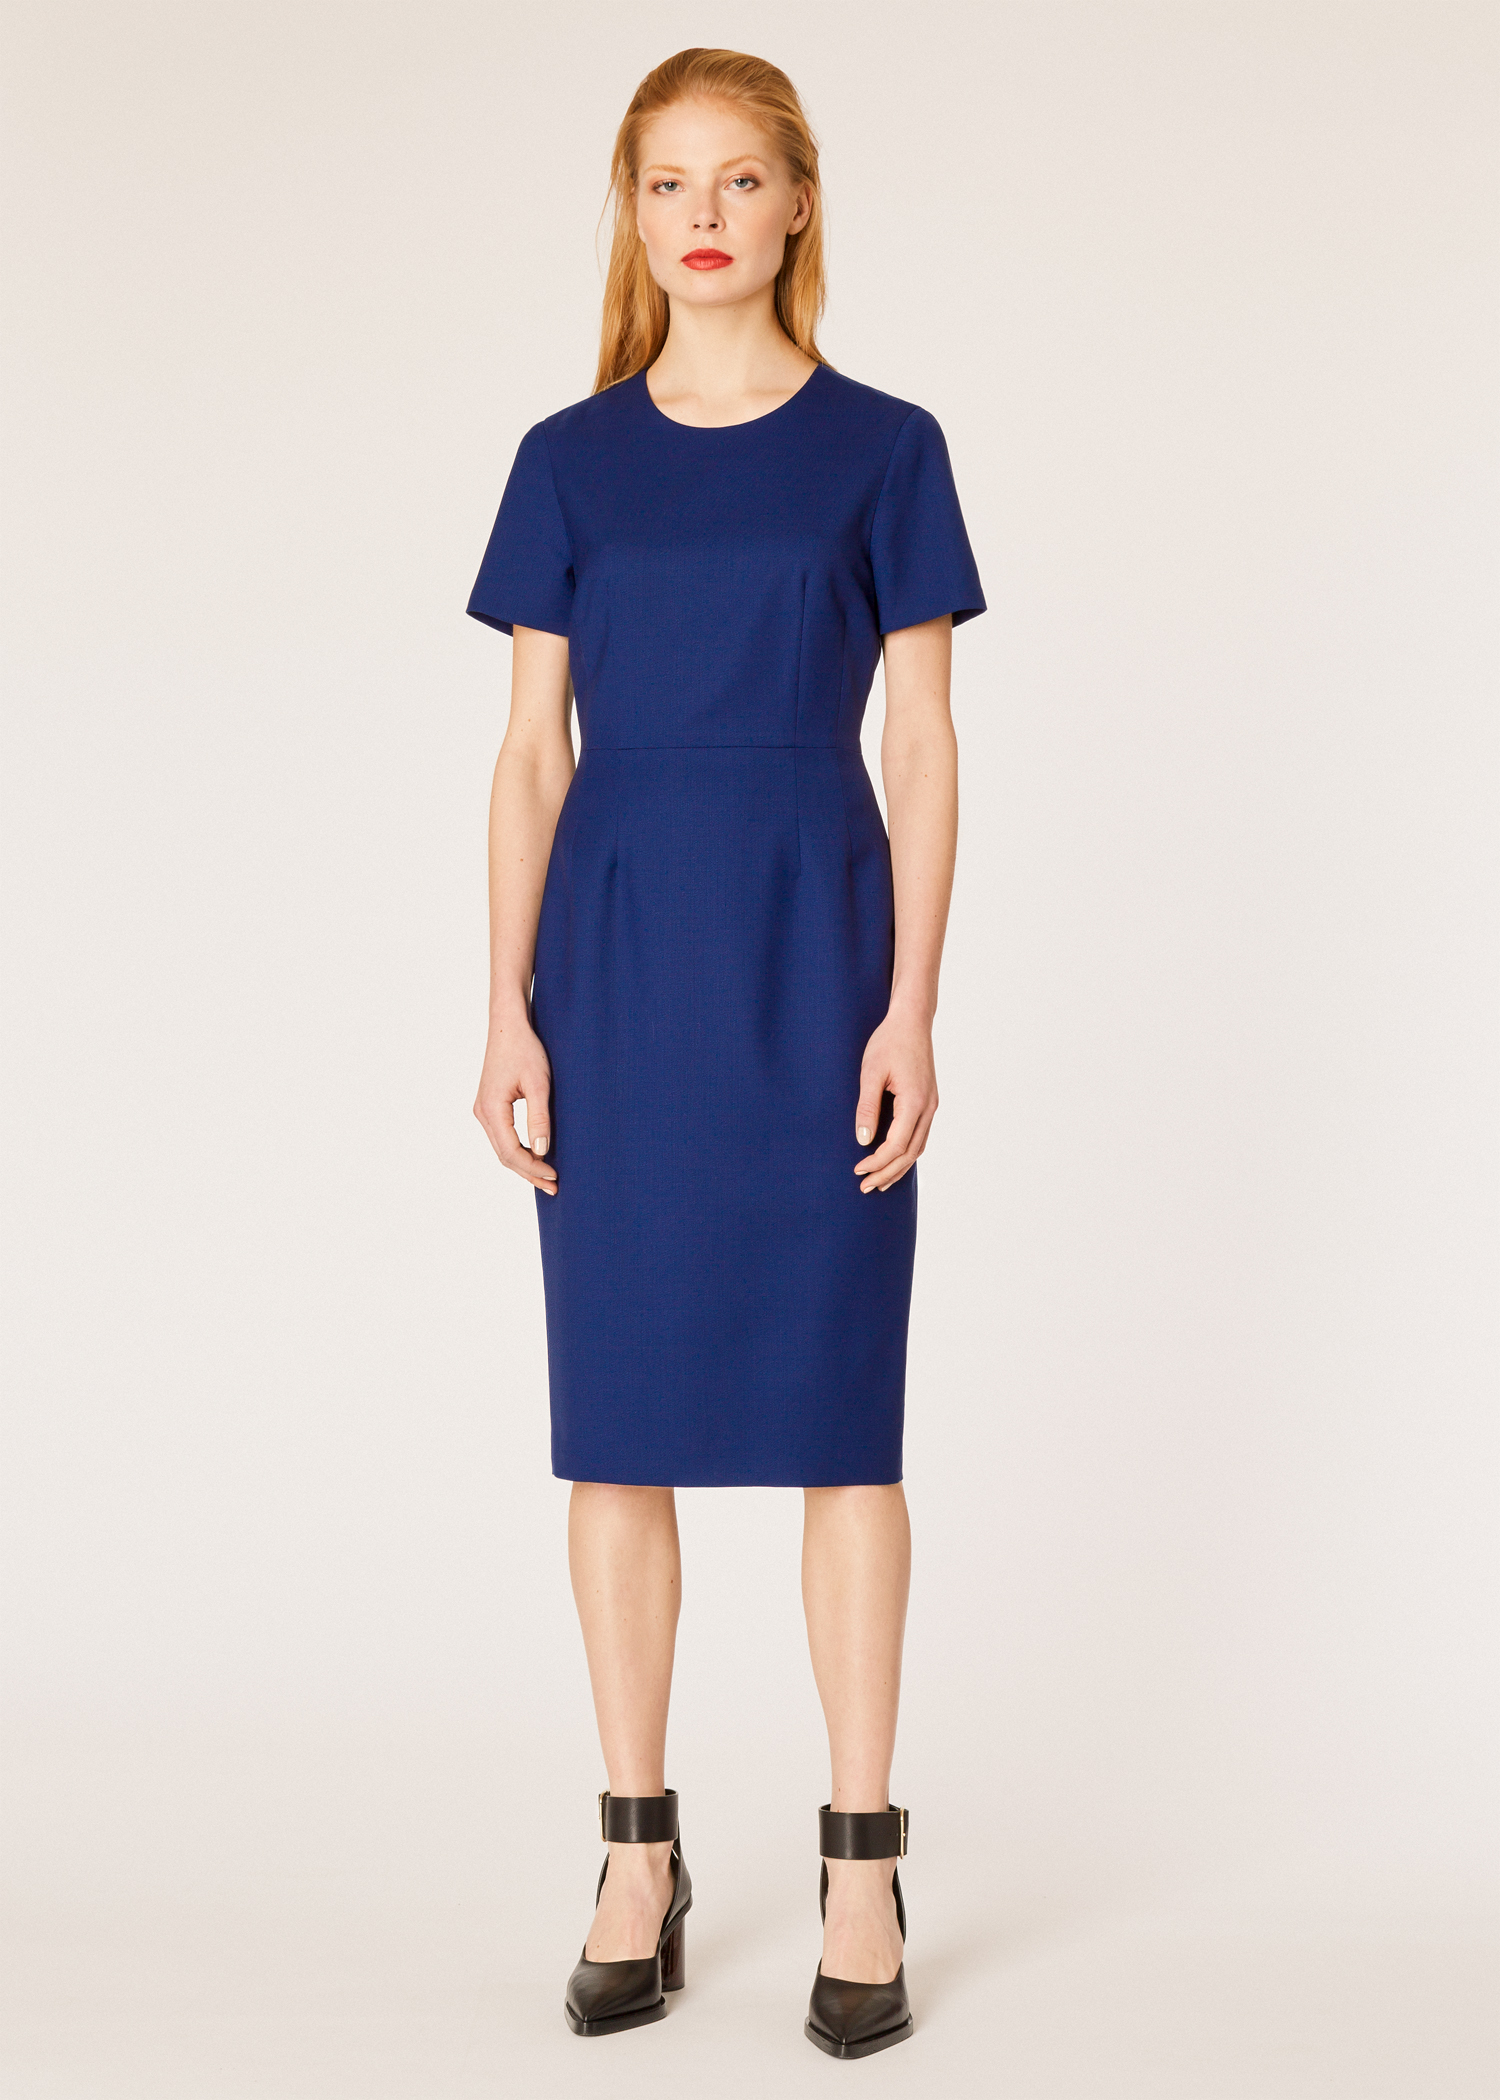 71d482f203e Vue mannequin face - Robe Femme Bleue  A Dress To Travel In  En Twill